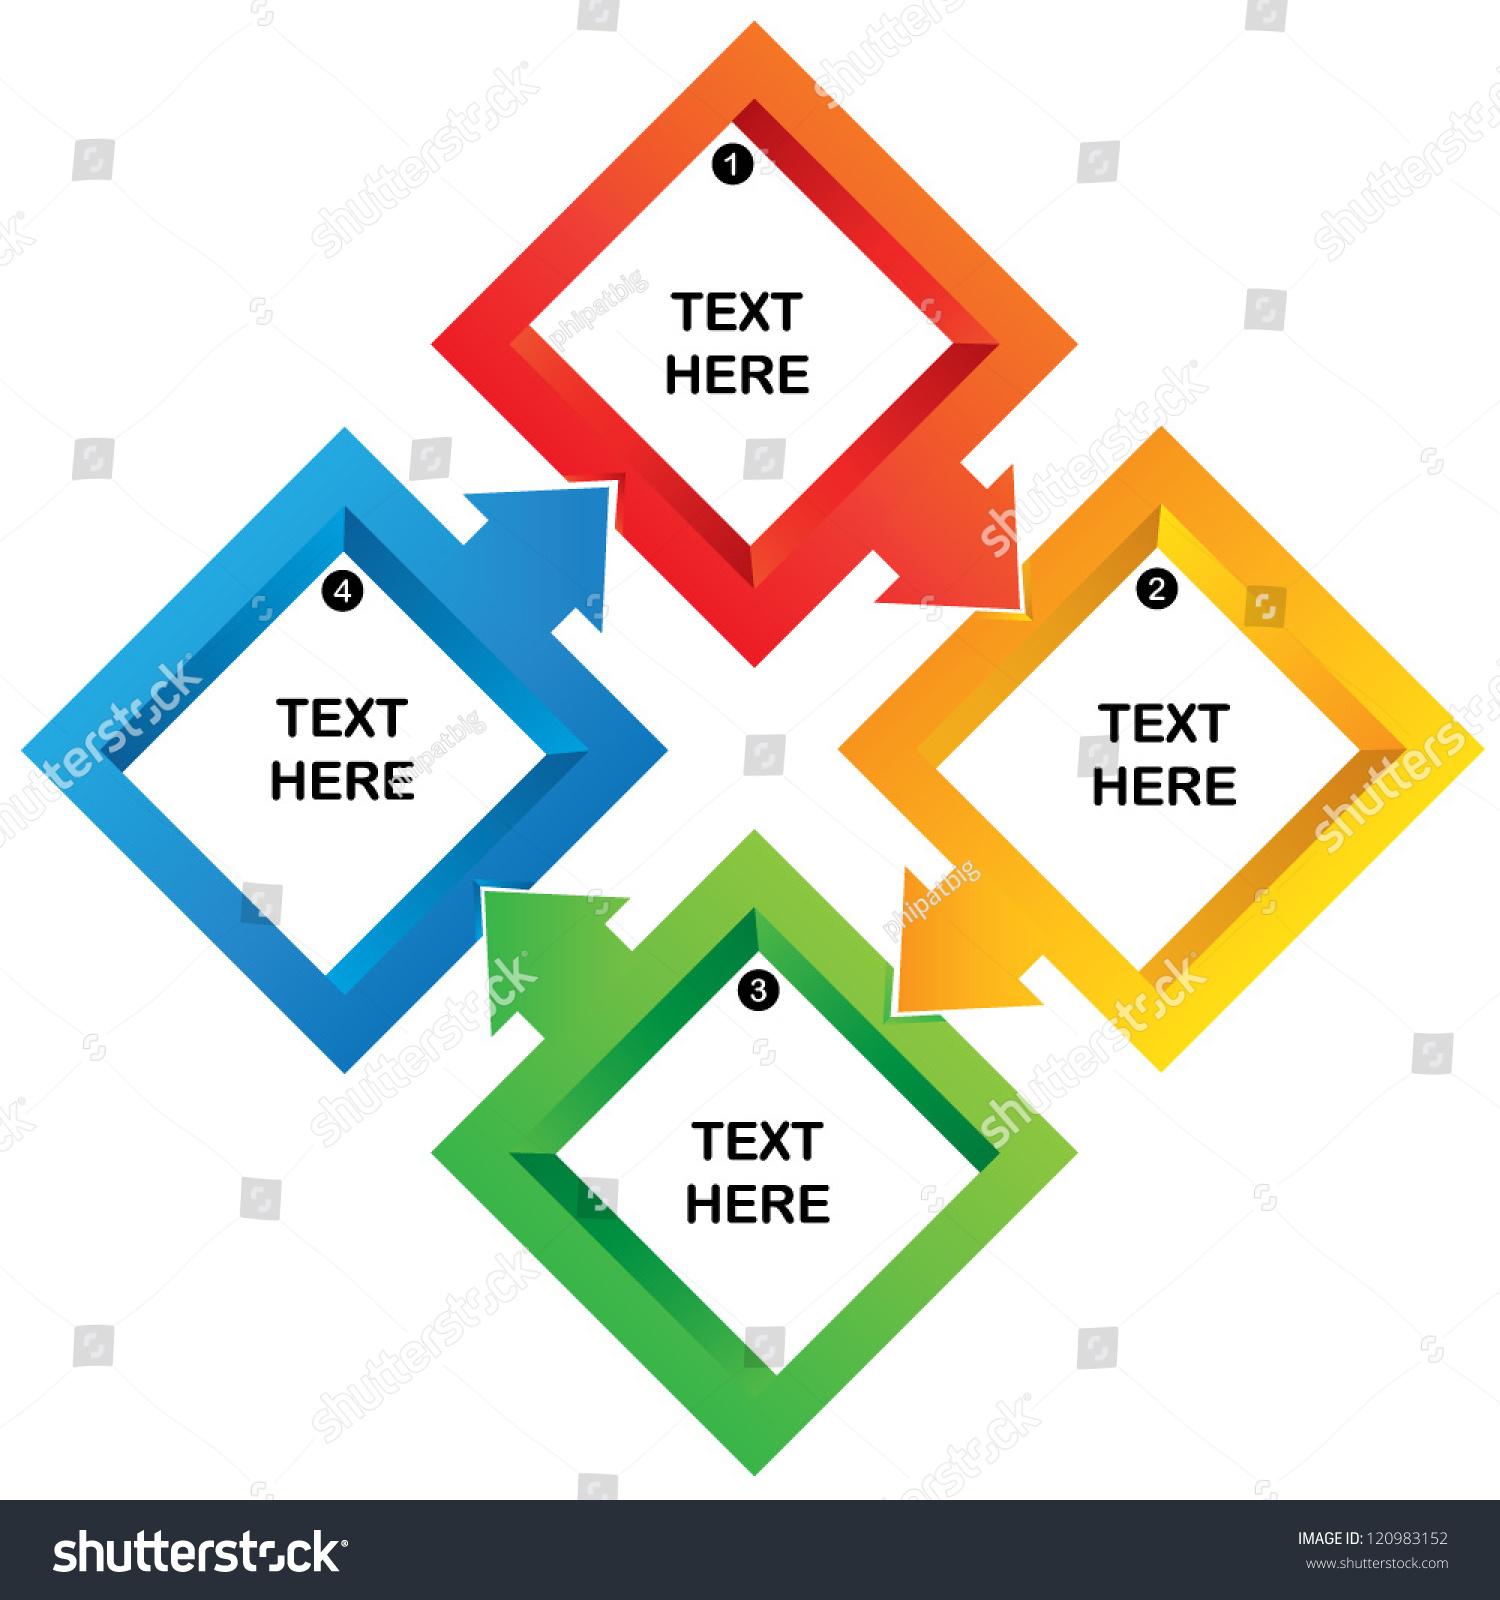 Process Chart Template Stock Vector Square Flow Chart Presentation Template  Process Diagram 120983152 Process Chart Template Business Charts Square Root  ...